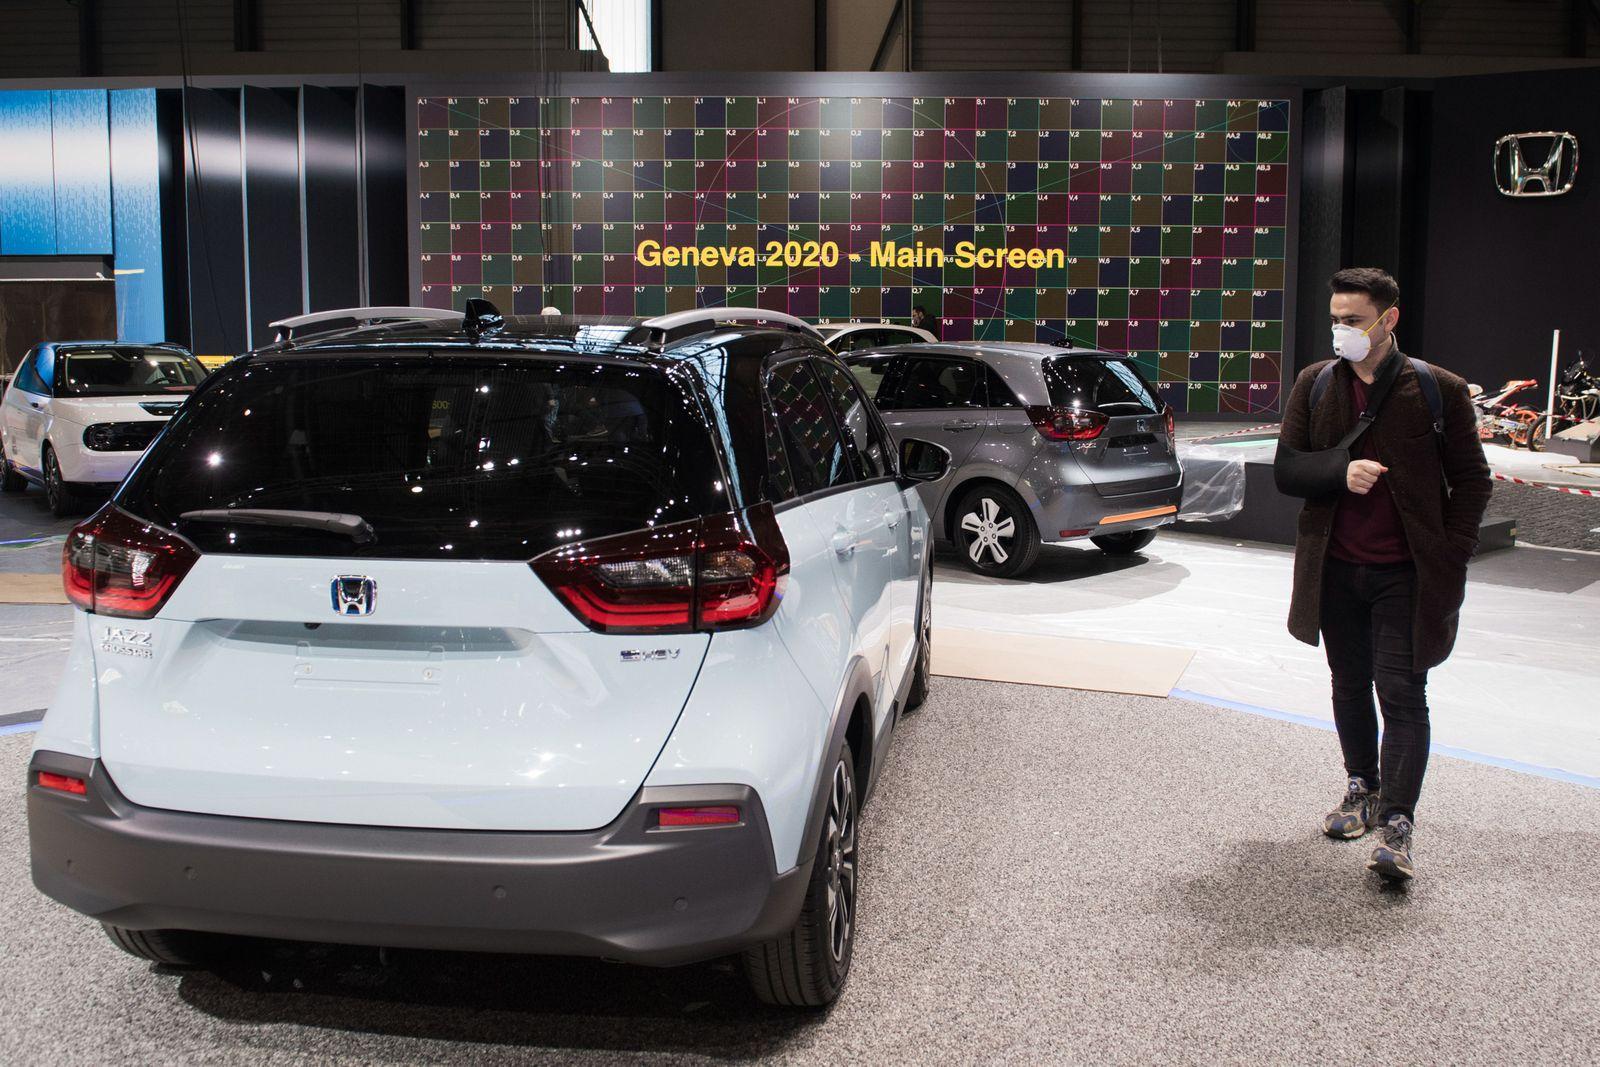 Geneva International Motor Show 2020